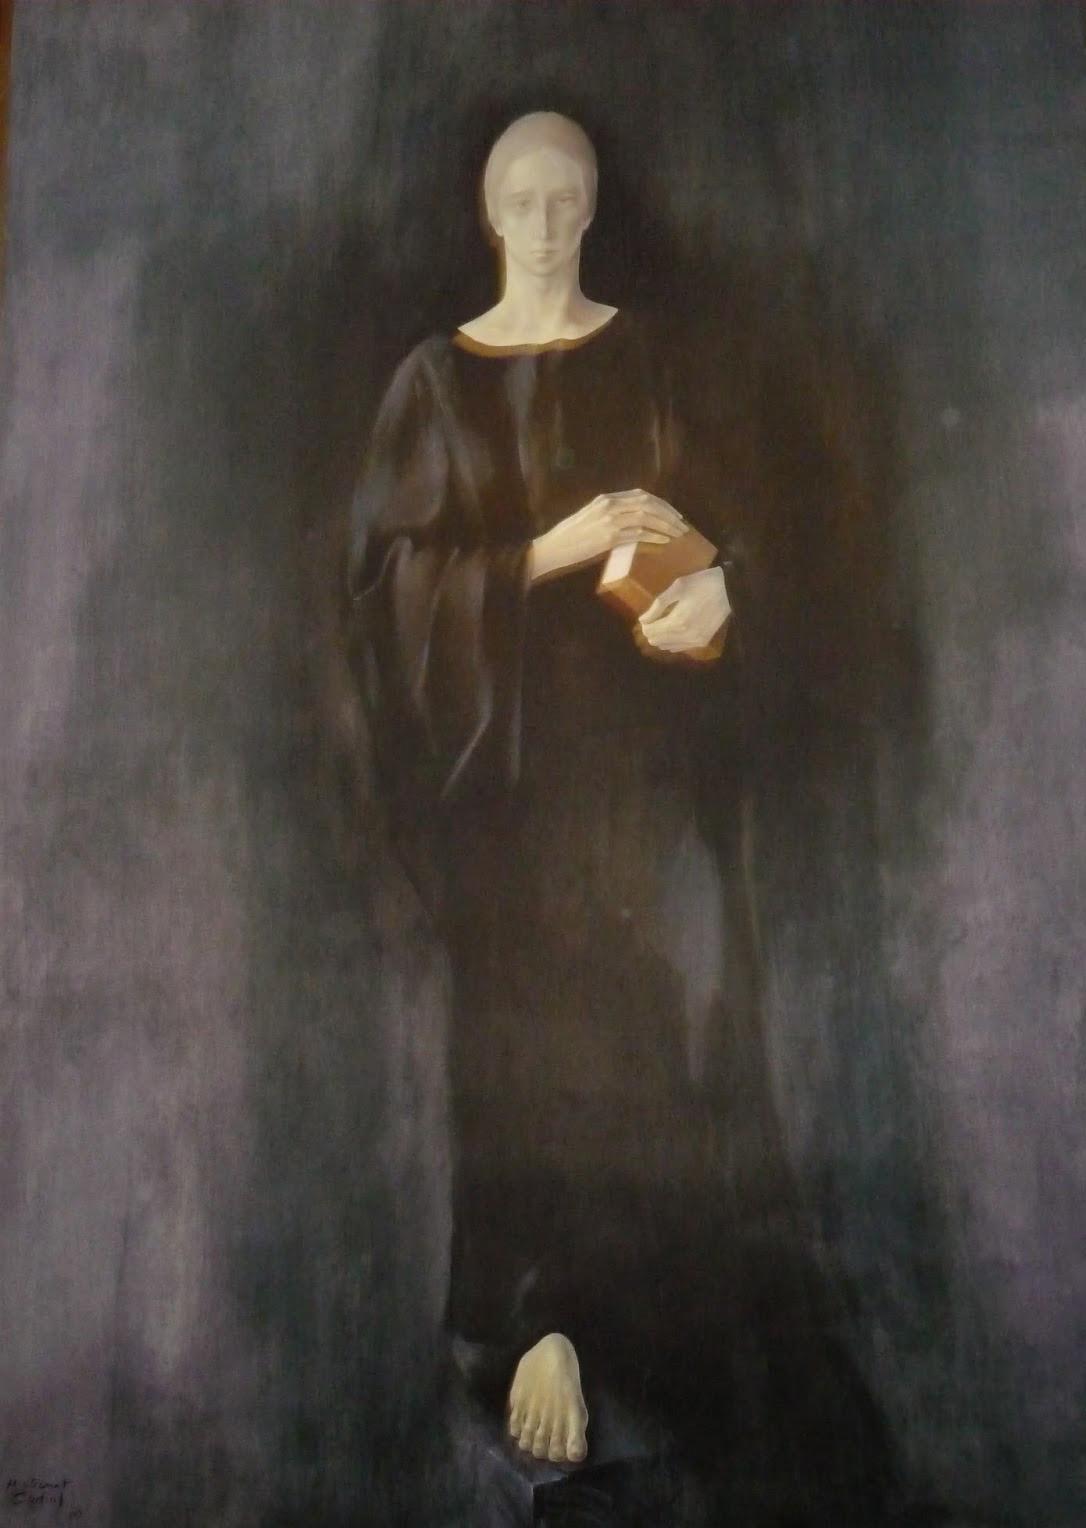 Sant Benet, 1980, abadía de Montserrat.